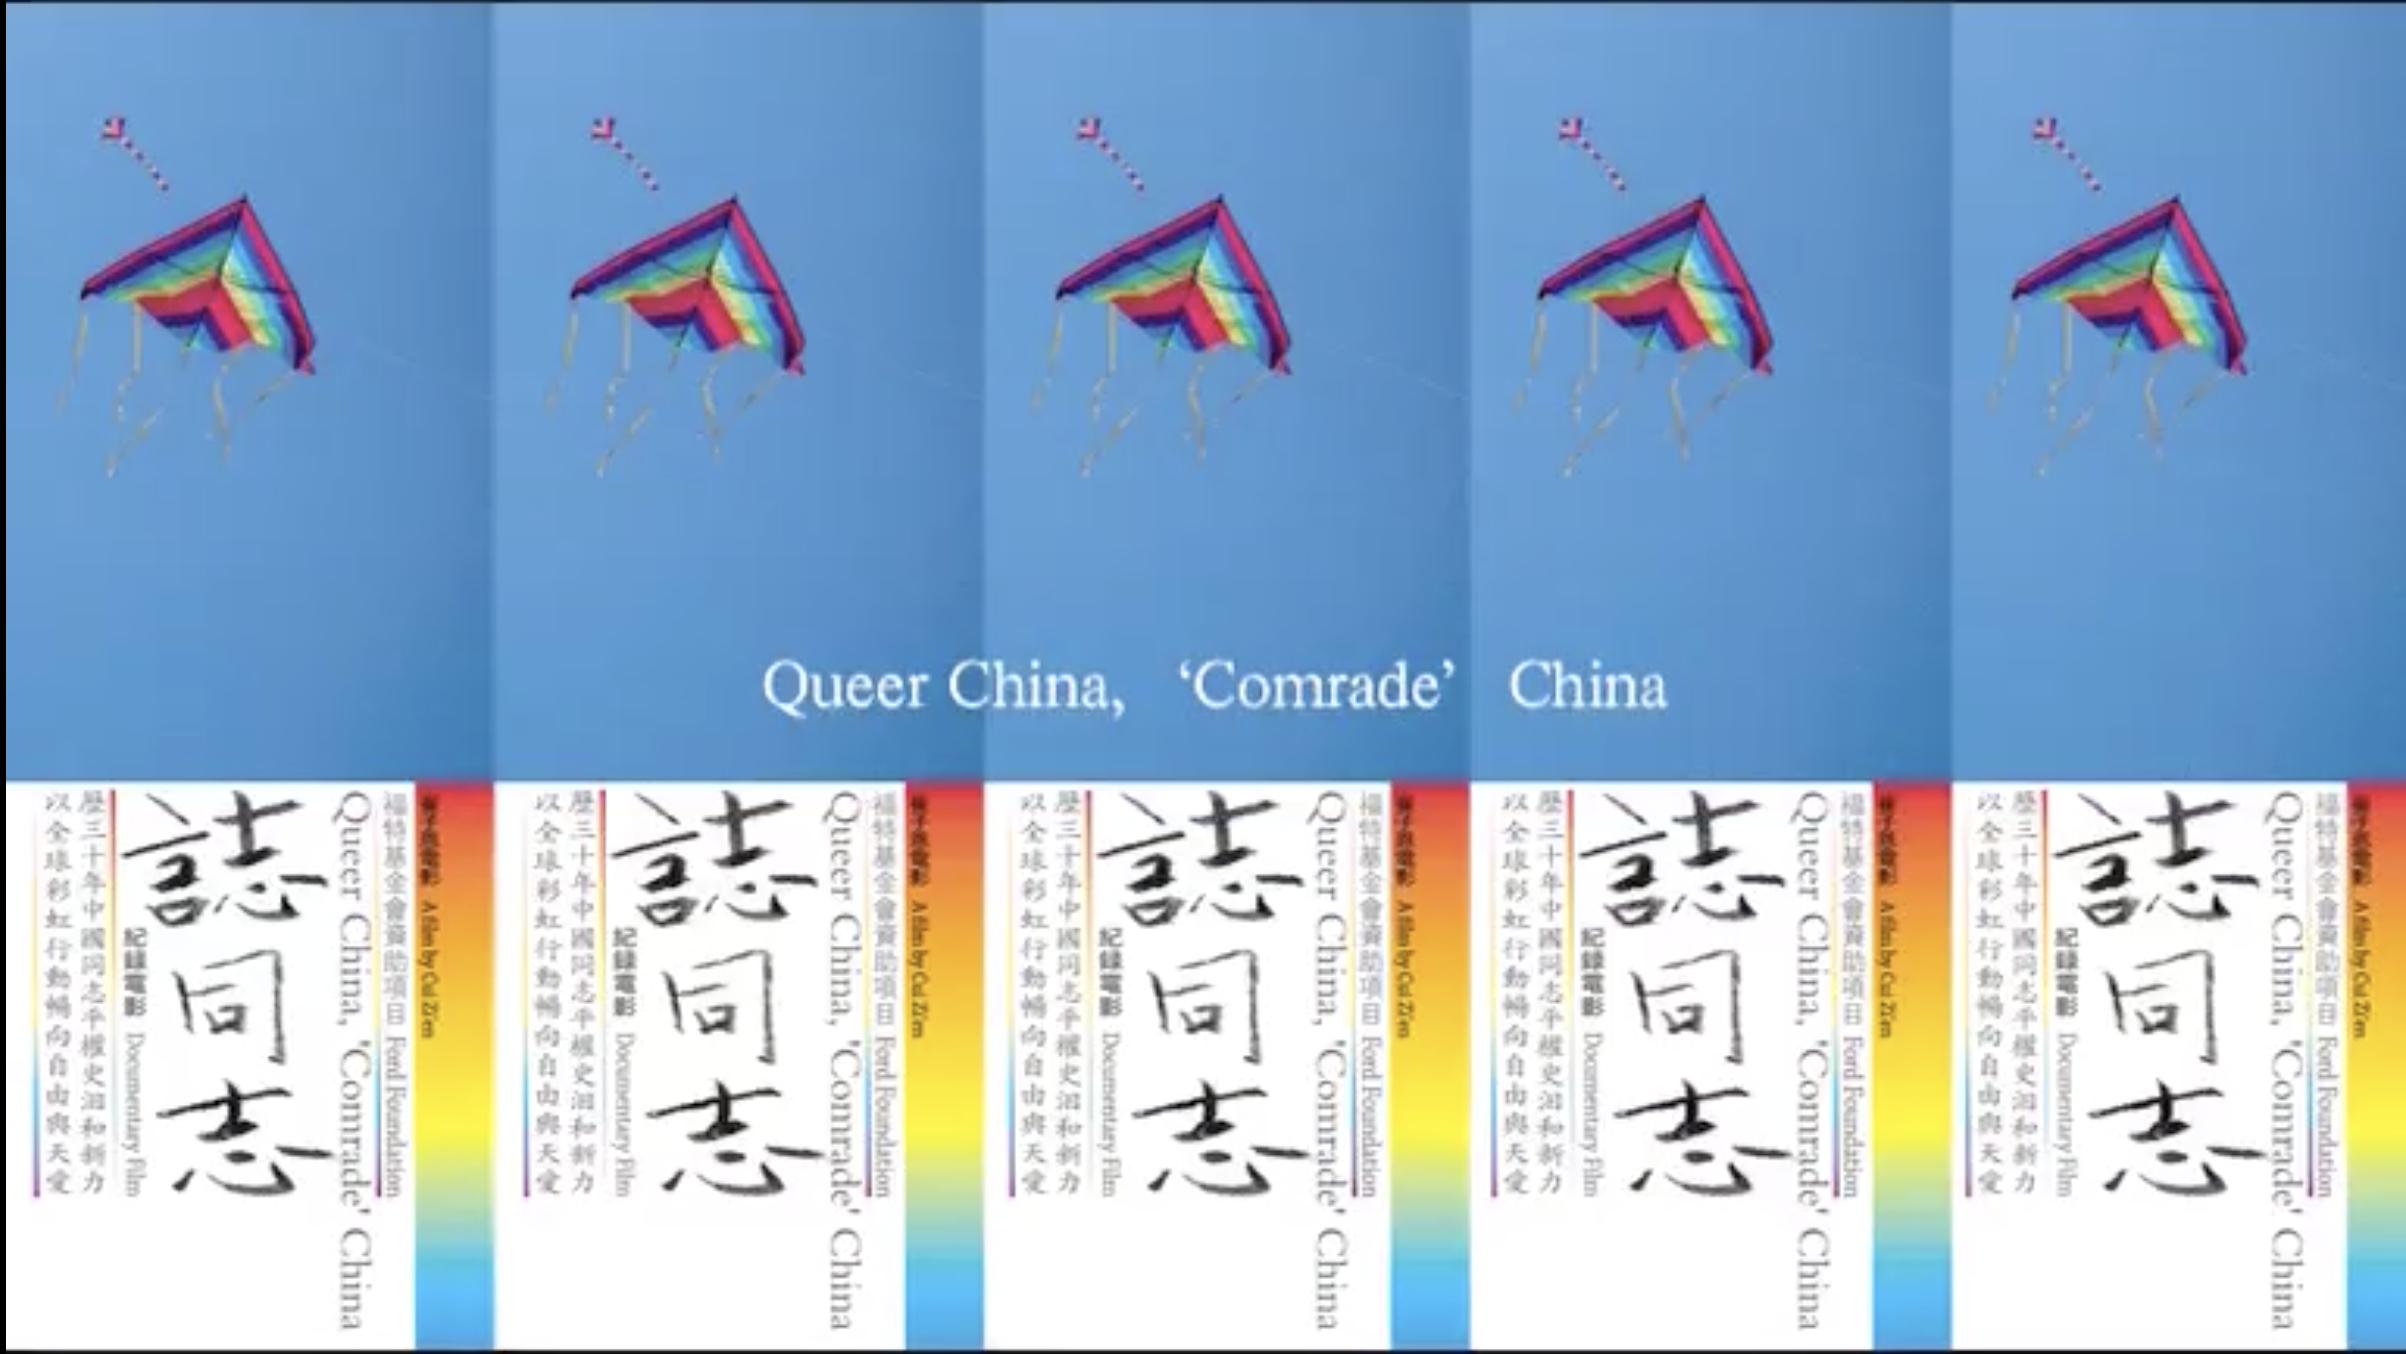 After Pride Month - Honoring China's Original LGBTQ